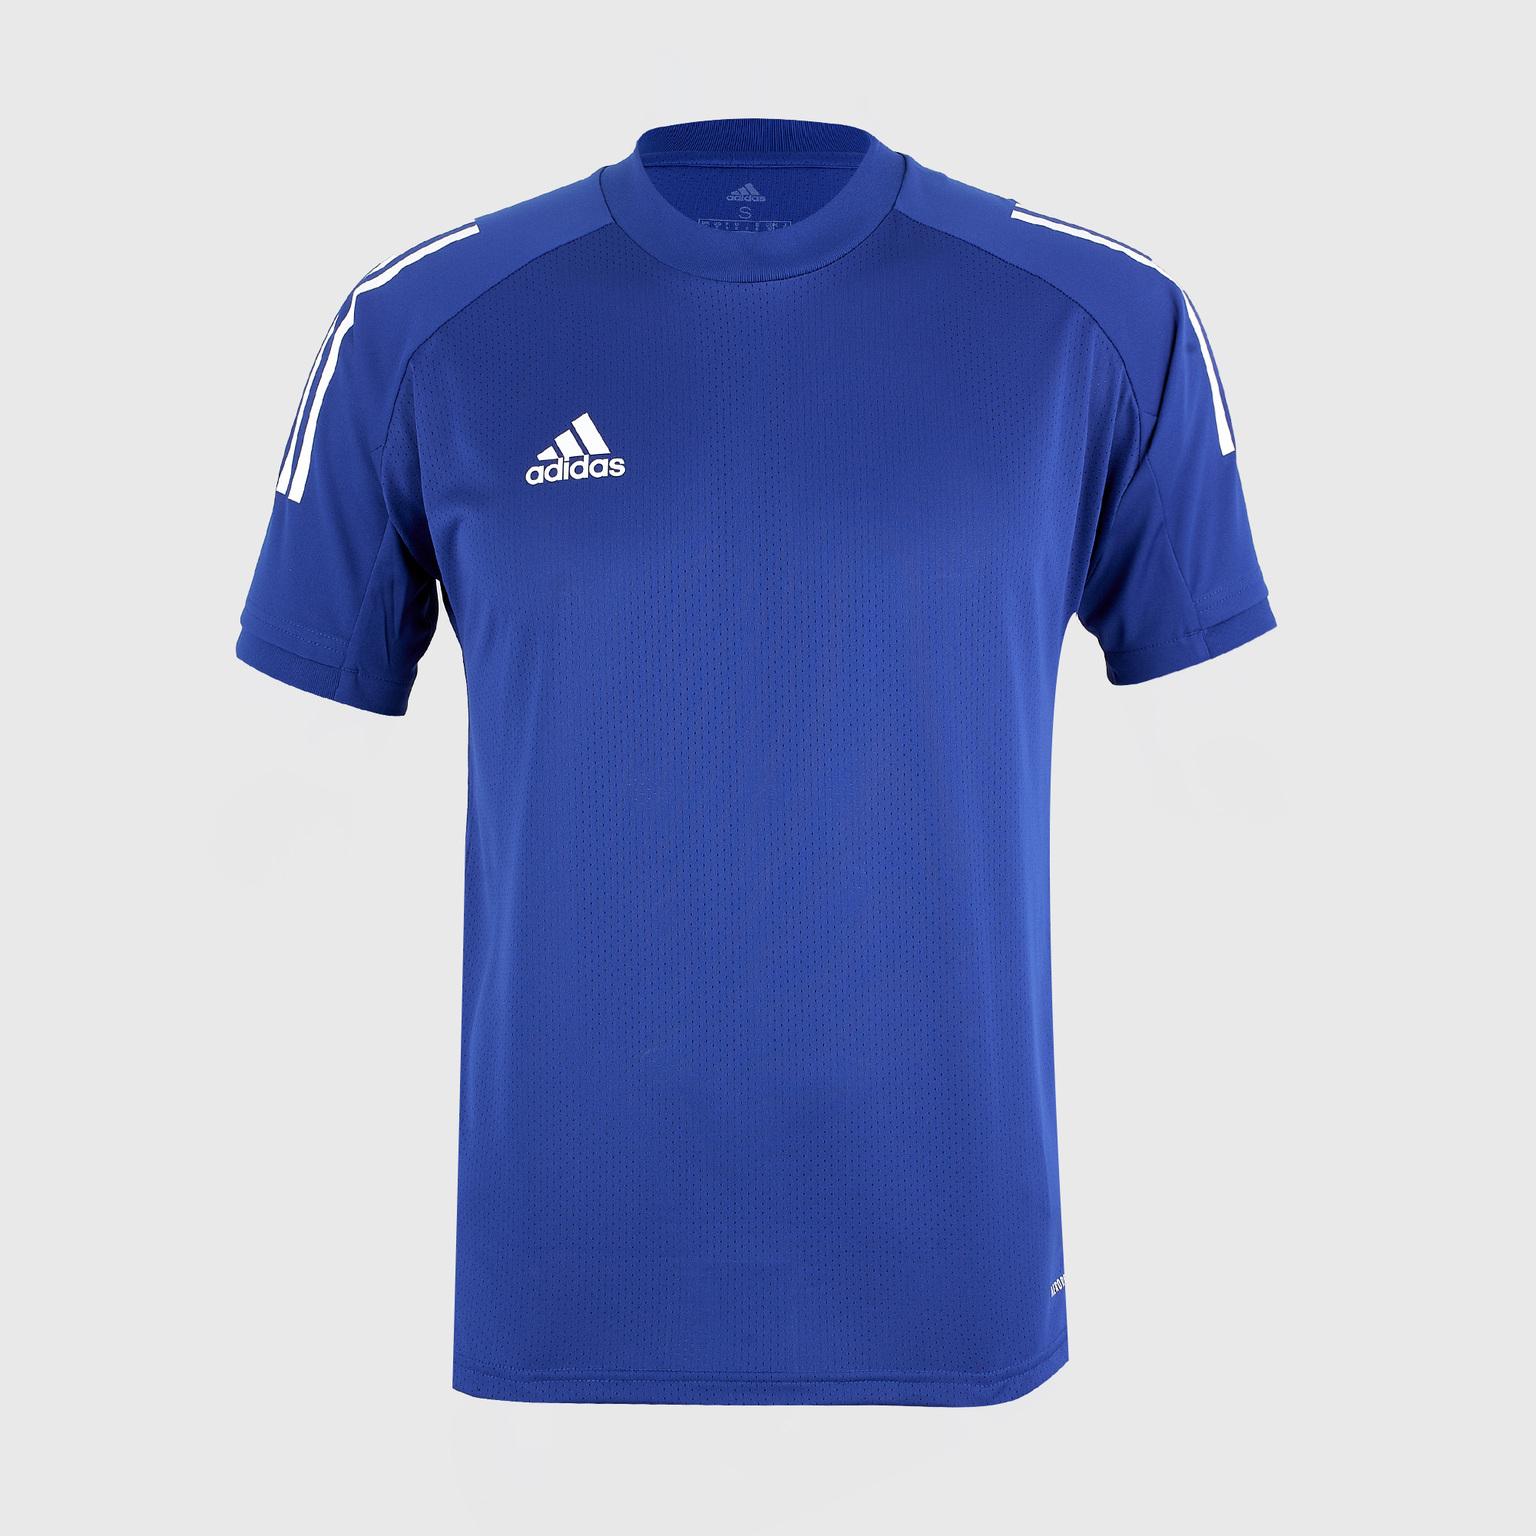 цена на Футболка тренировочная Adidas Con20 ED9219